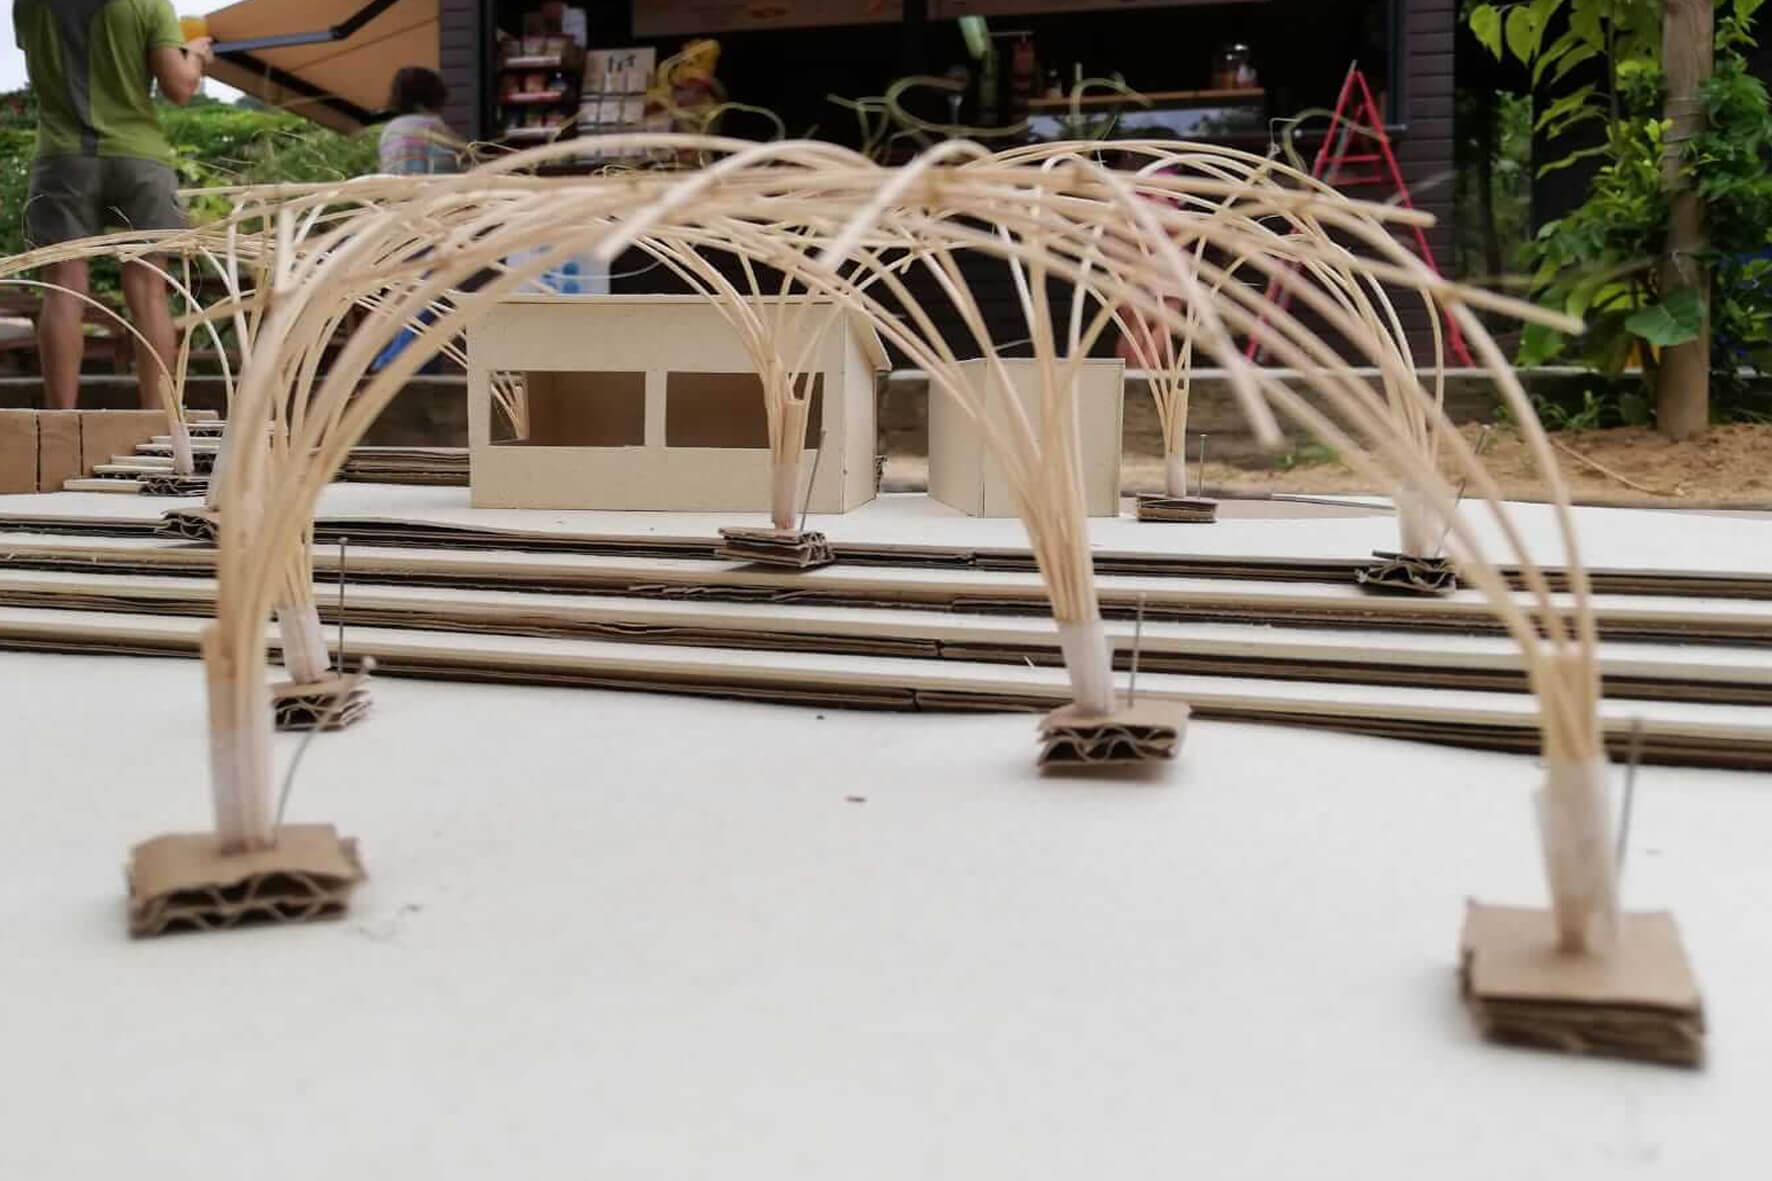 Projecte cúpula vegetal | Fundraising | Jardí Botànic Marimurtra